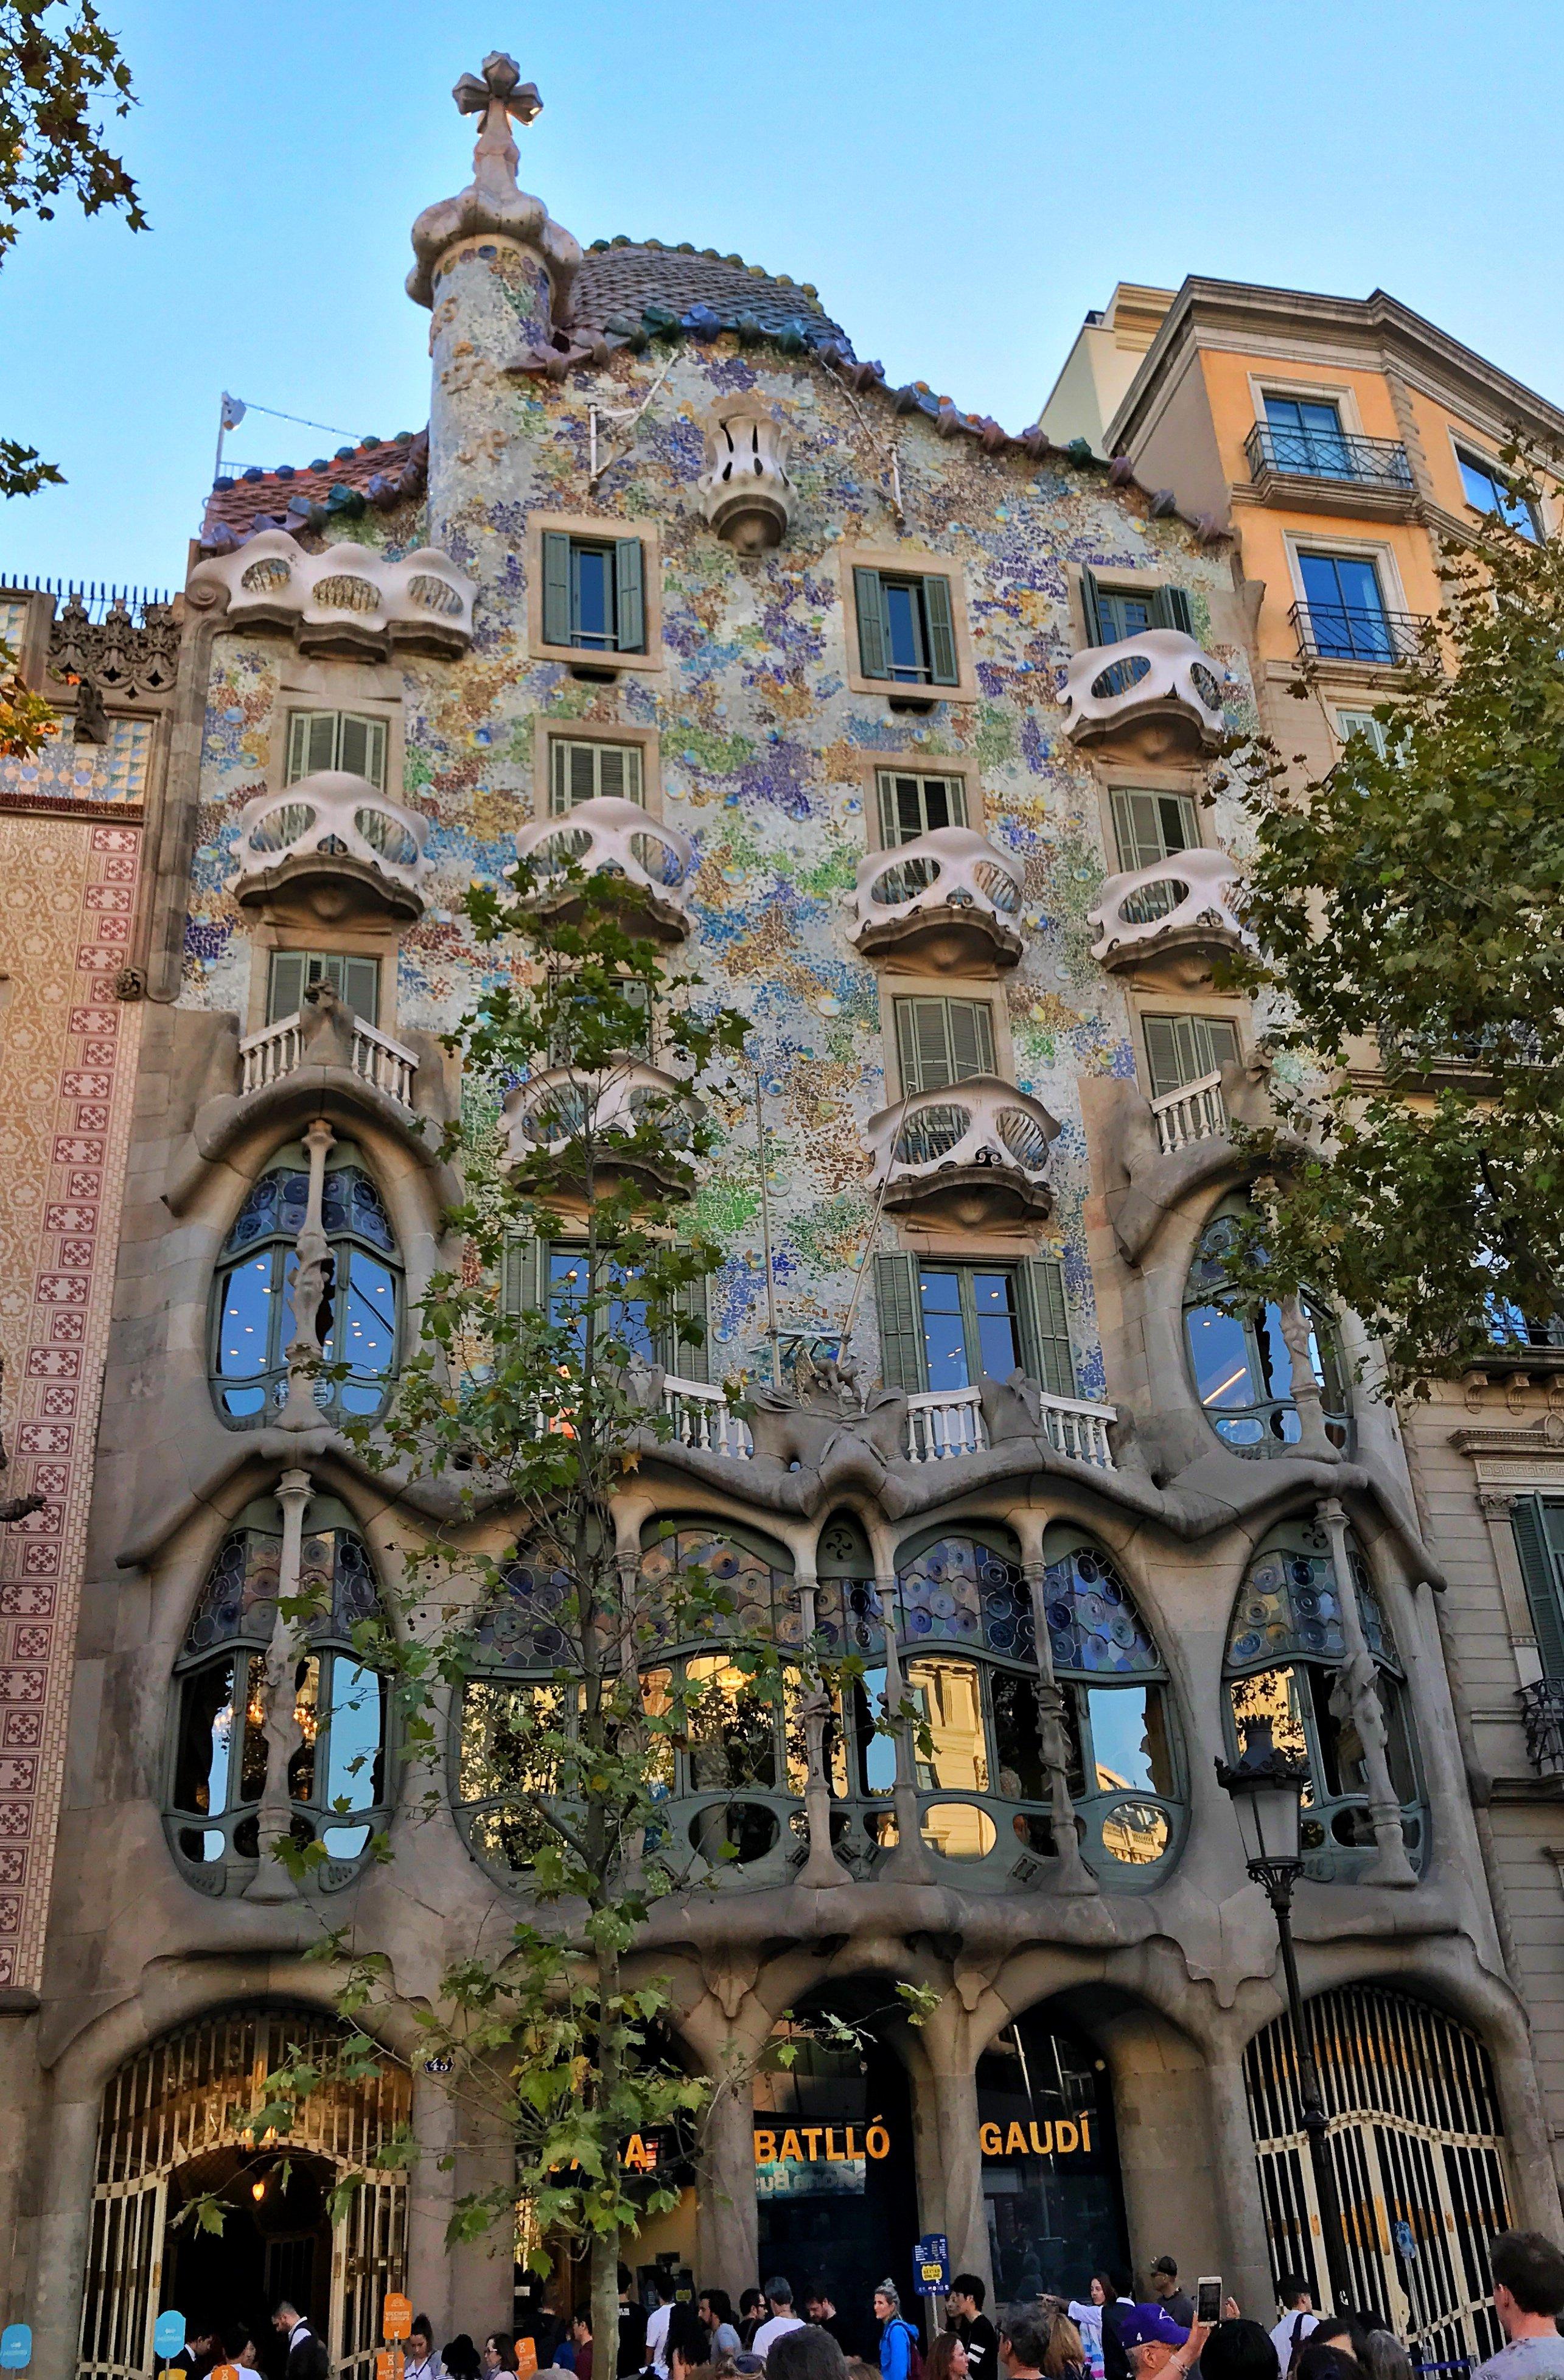 LGBT travel guide Barcelona - Gaudi architecture